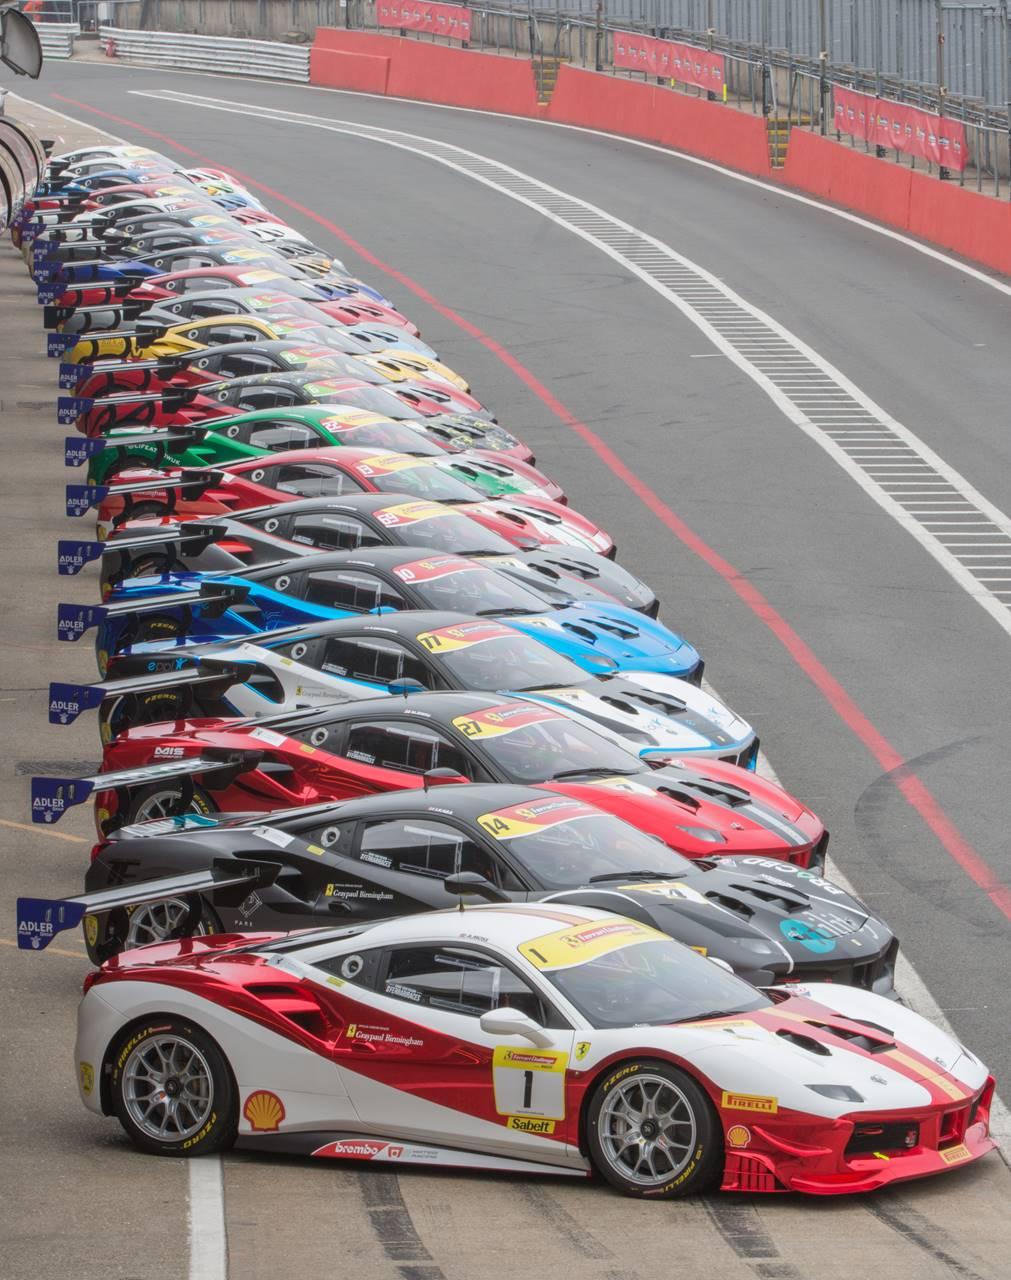 Ferrari Challenge Uk Title Decider At Silverstone 2122 September 2019 Conceptcarz Com